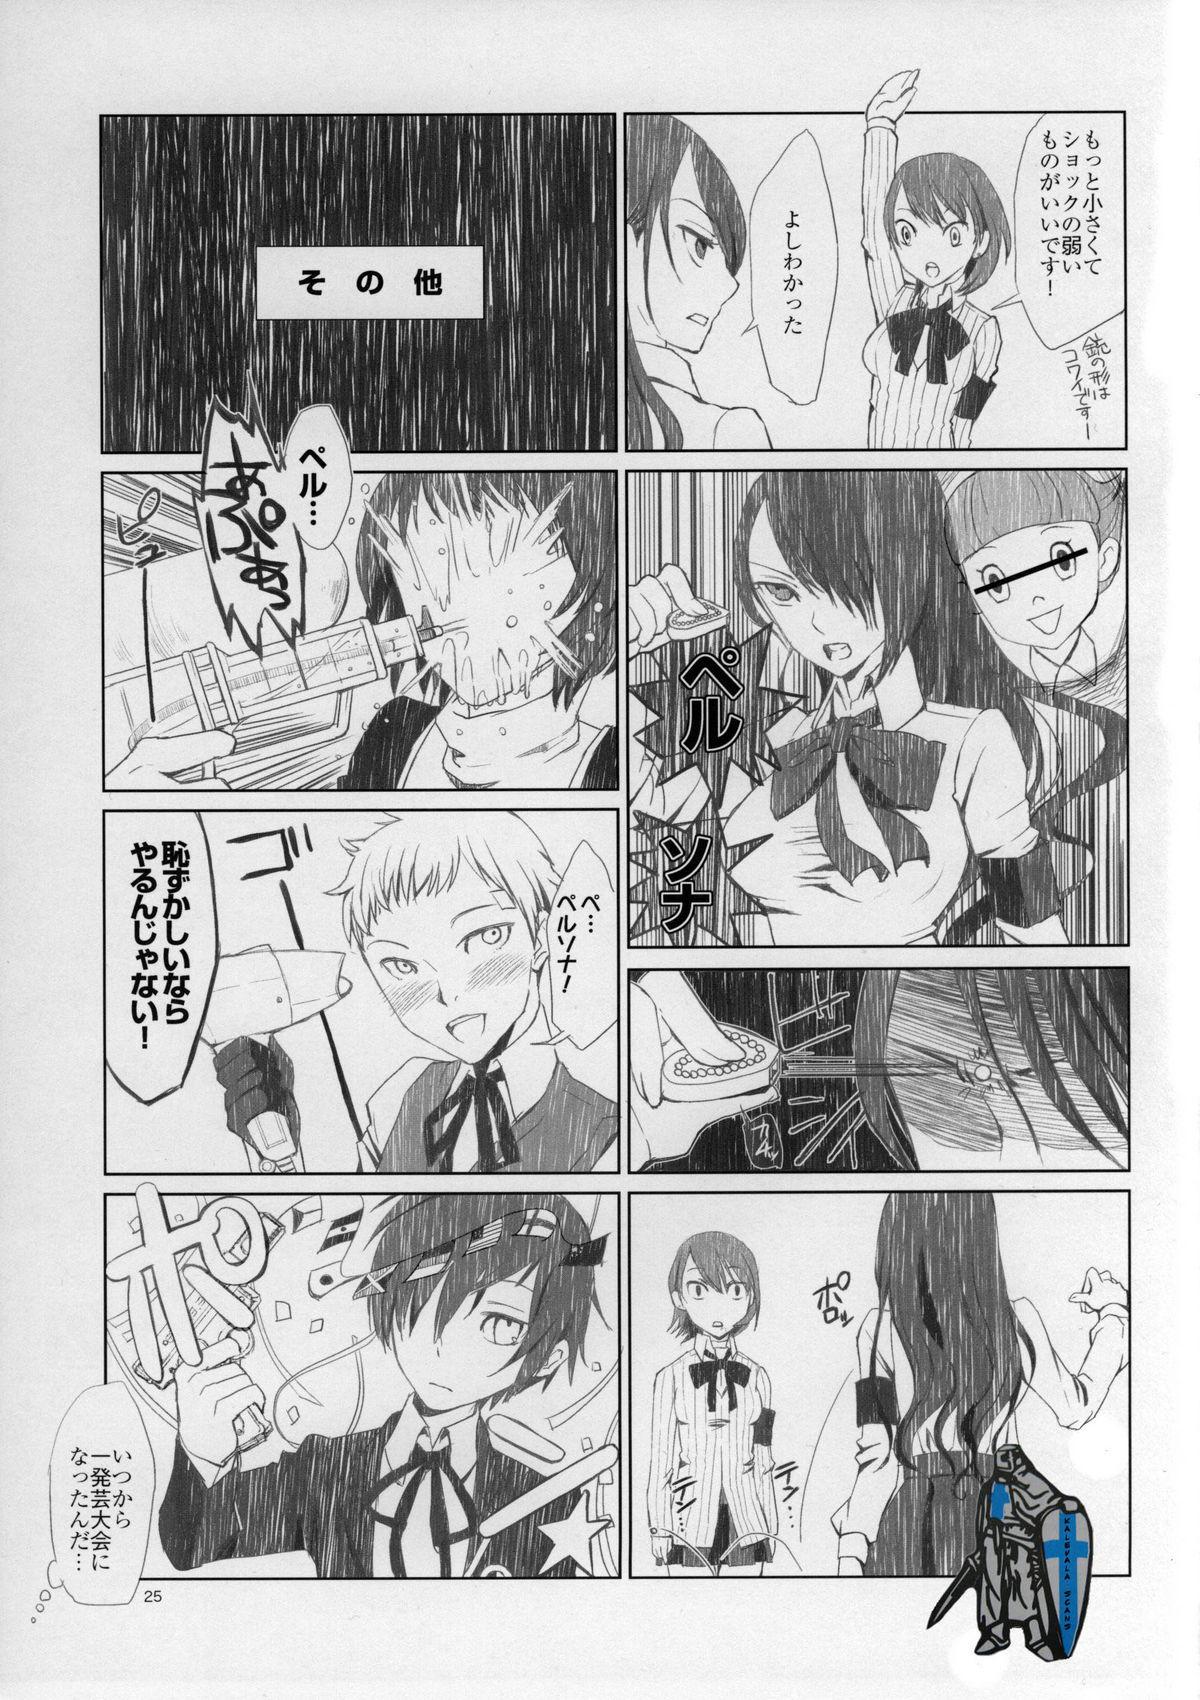 YURI SONA 2 Yoru no Joou - Midnight Queen 23